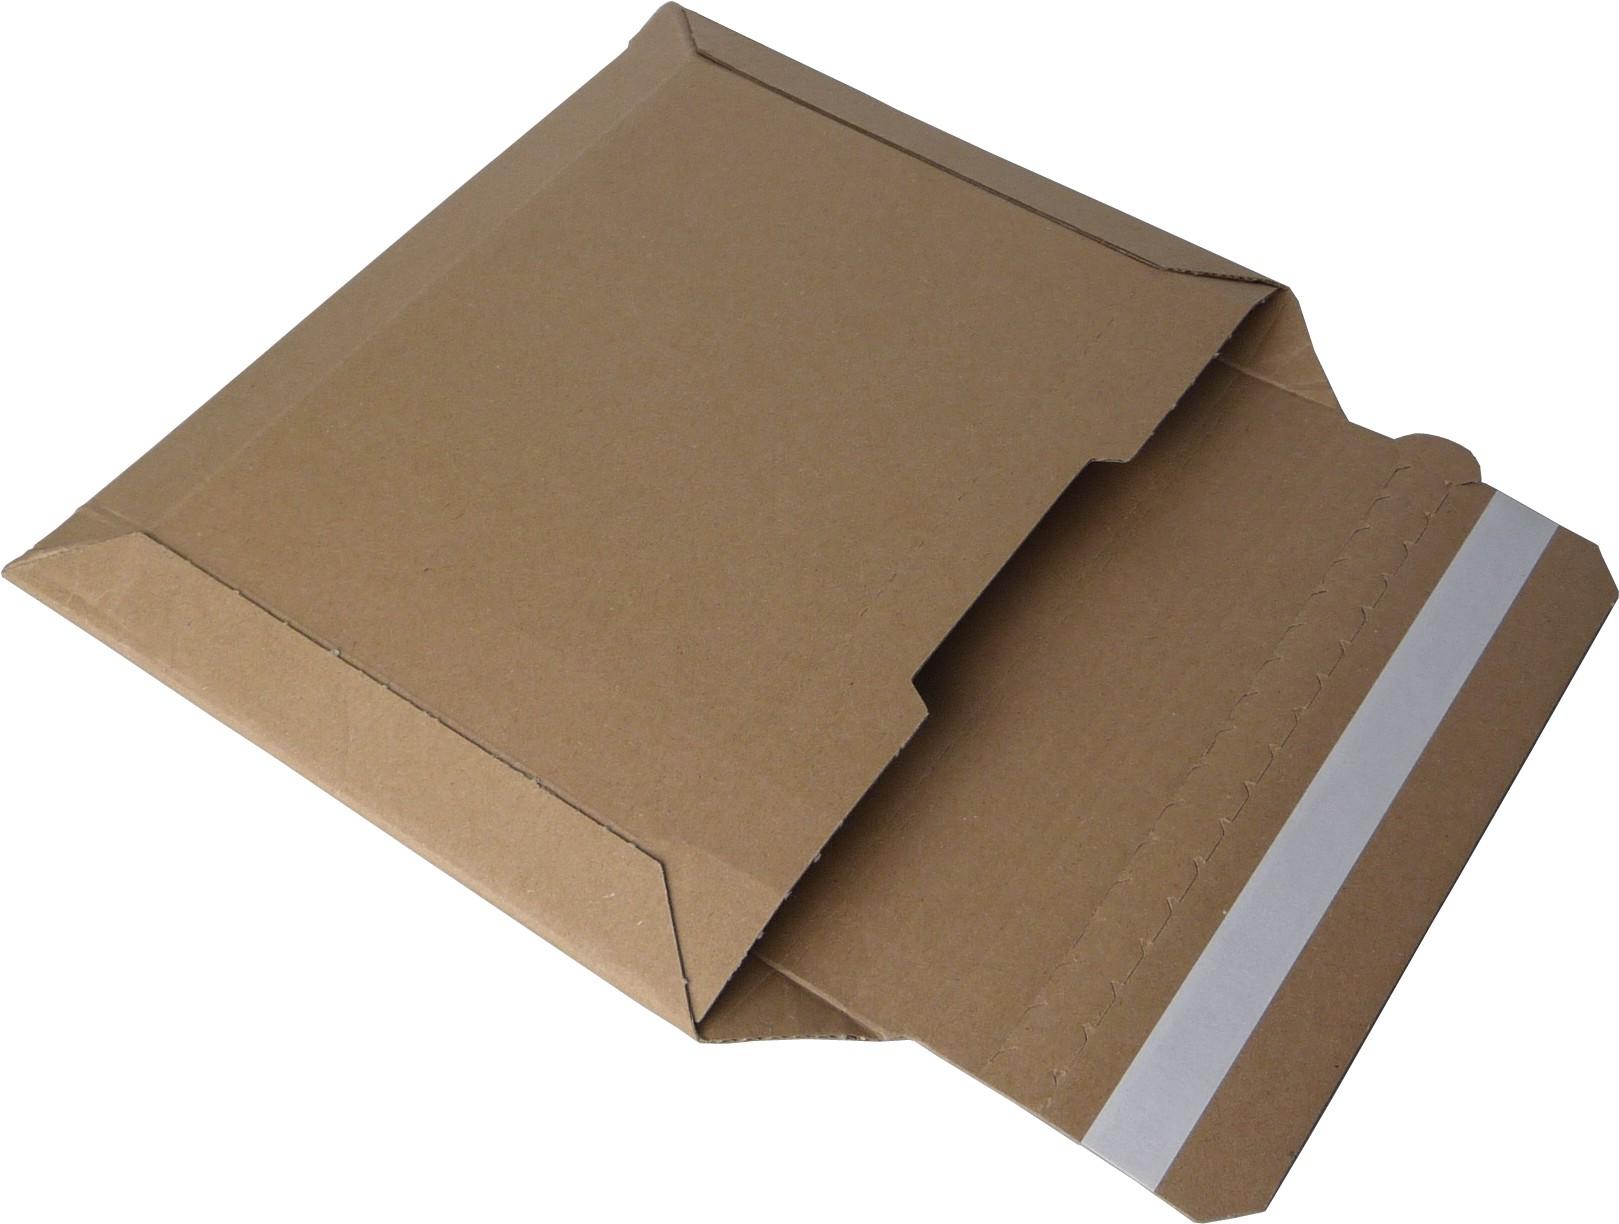 versandtasche karton versandkartons verpackung a5. Black Bedroom Furniture Sets. Home Design Ideas